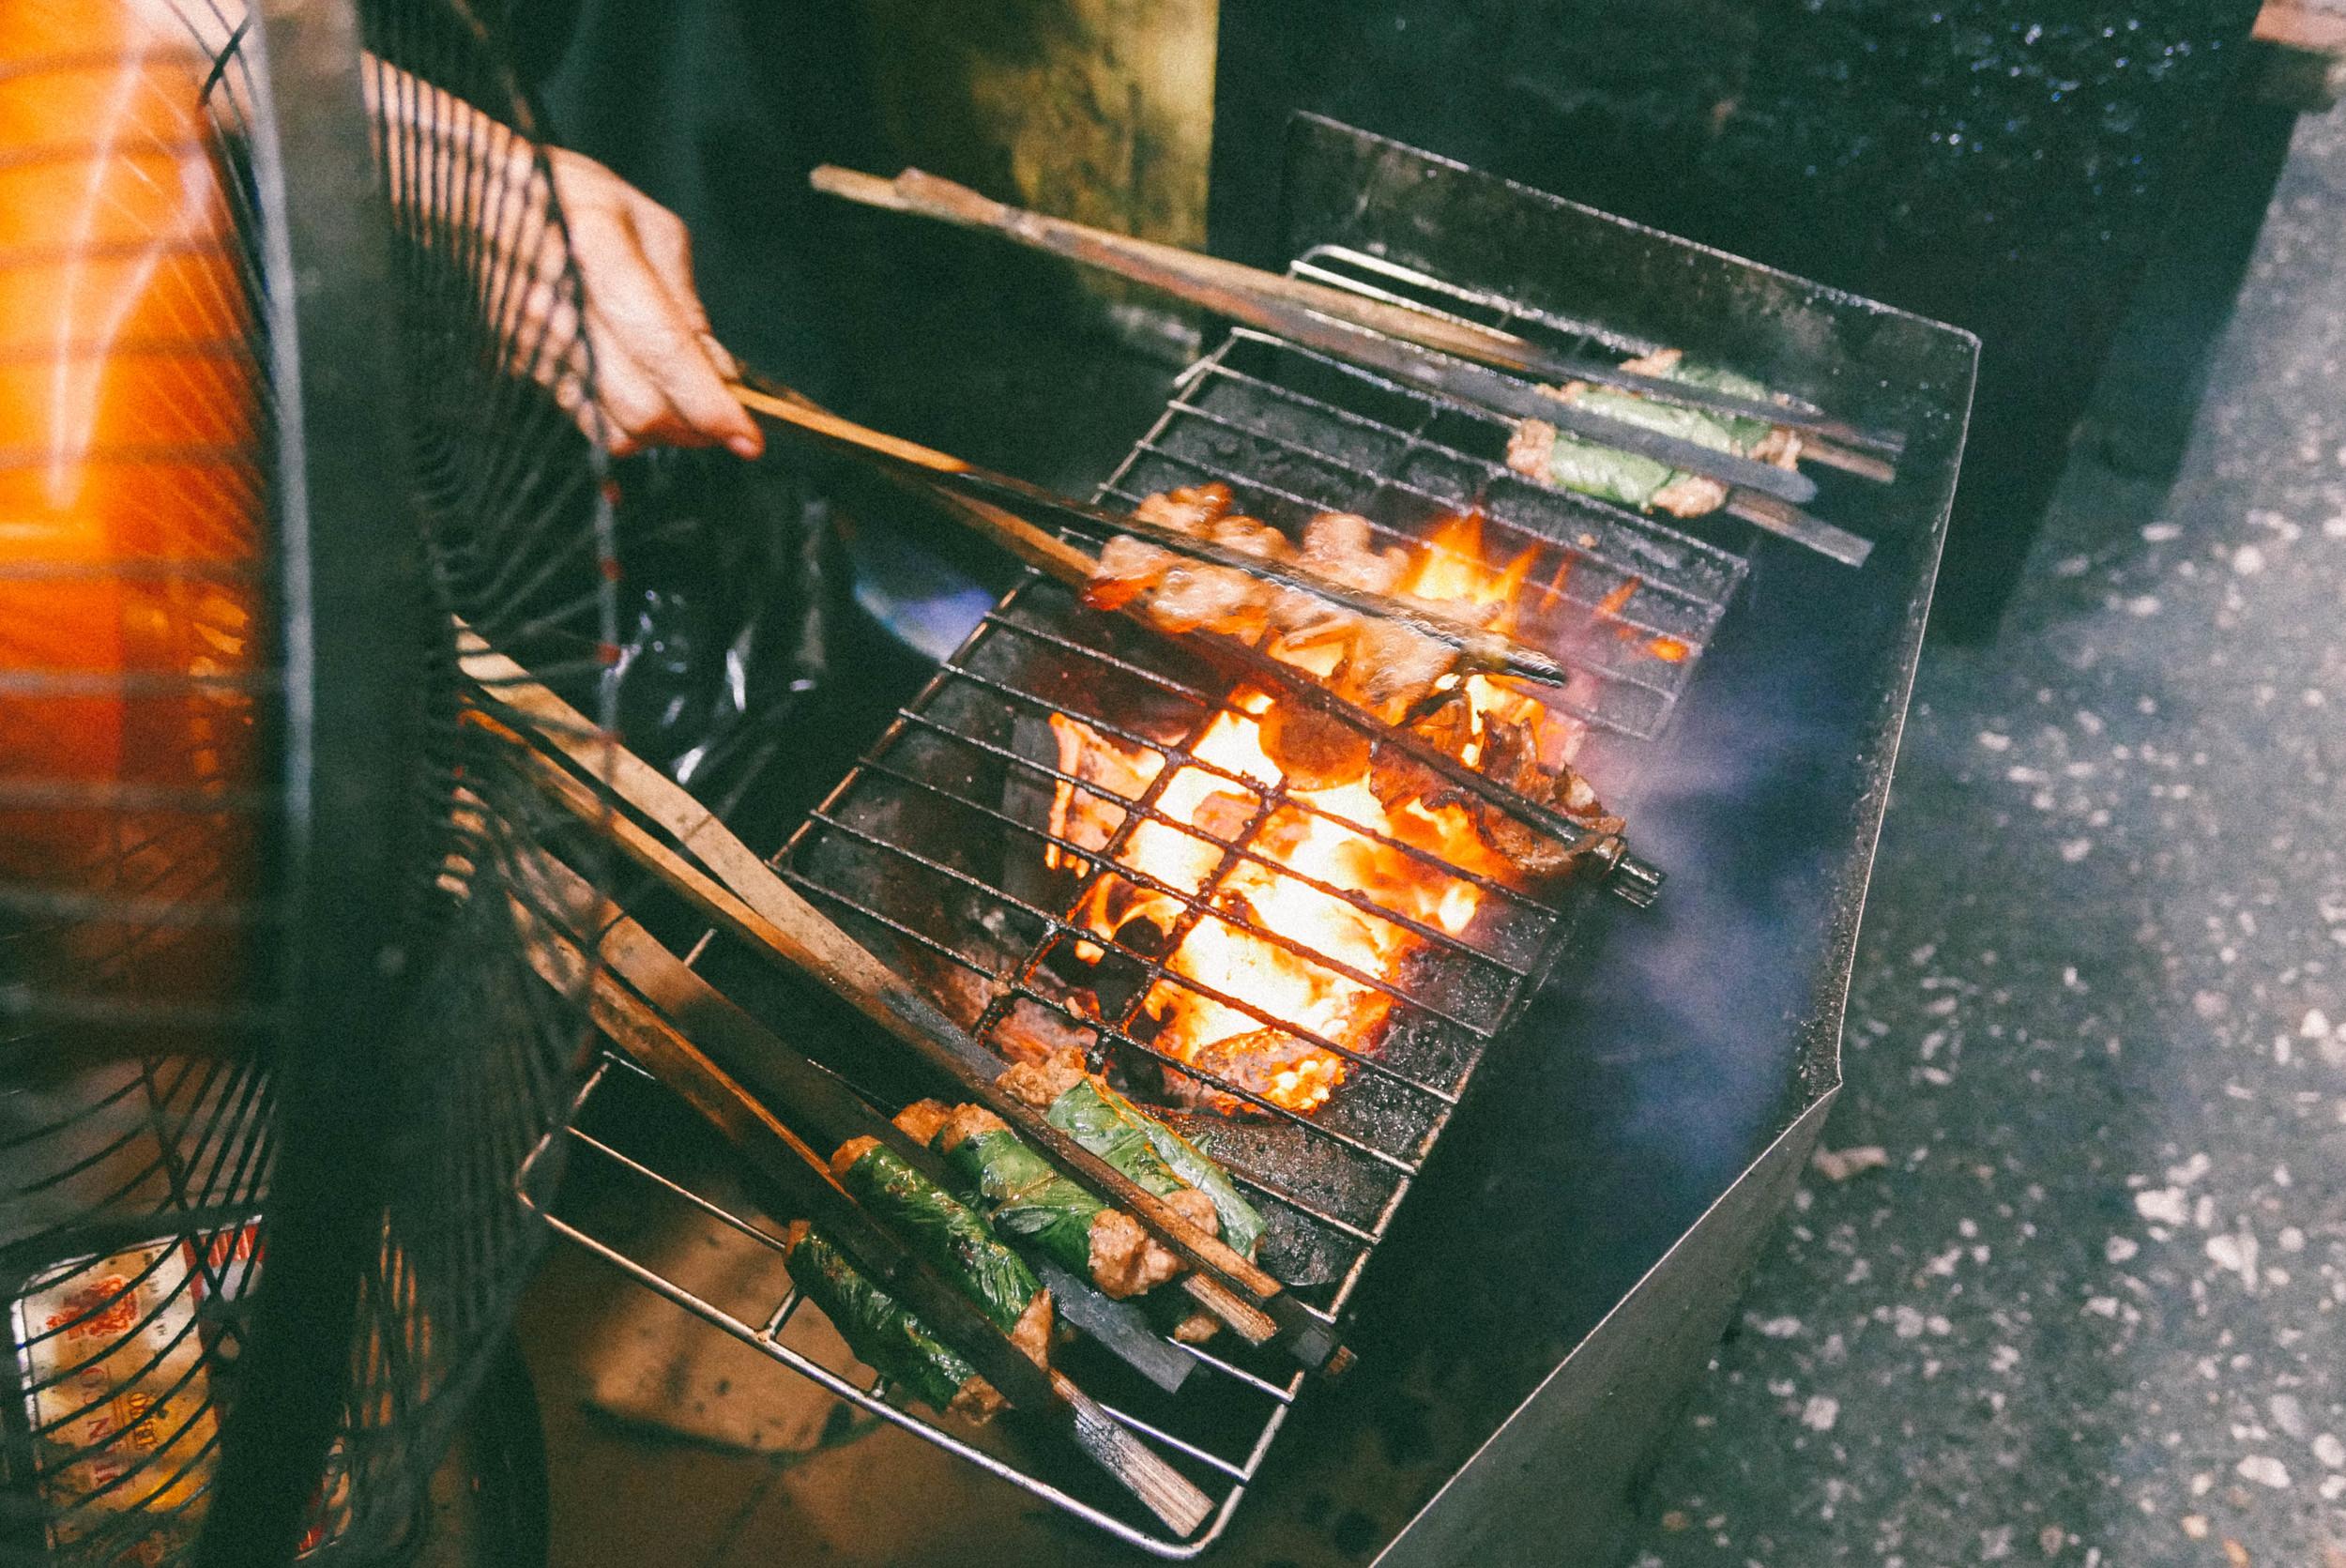 Grilling the pork patties for bun cha.